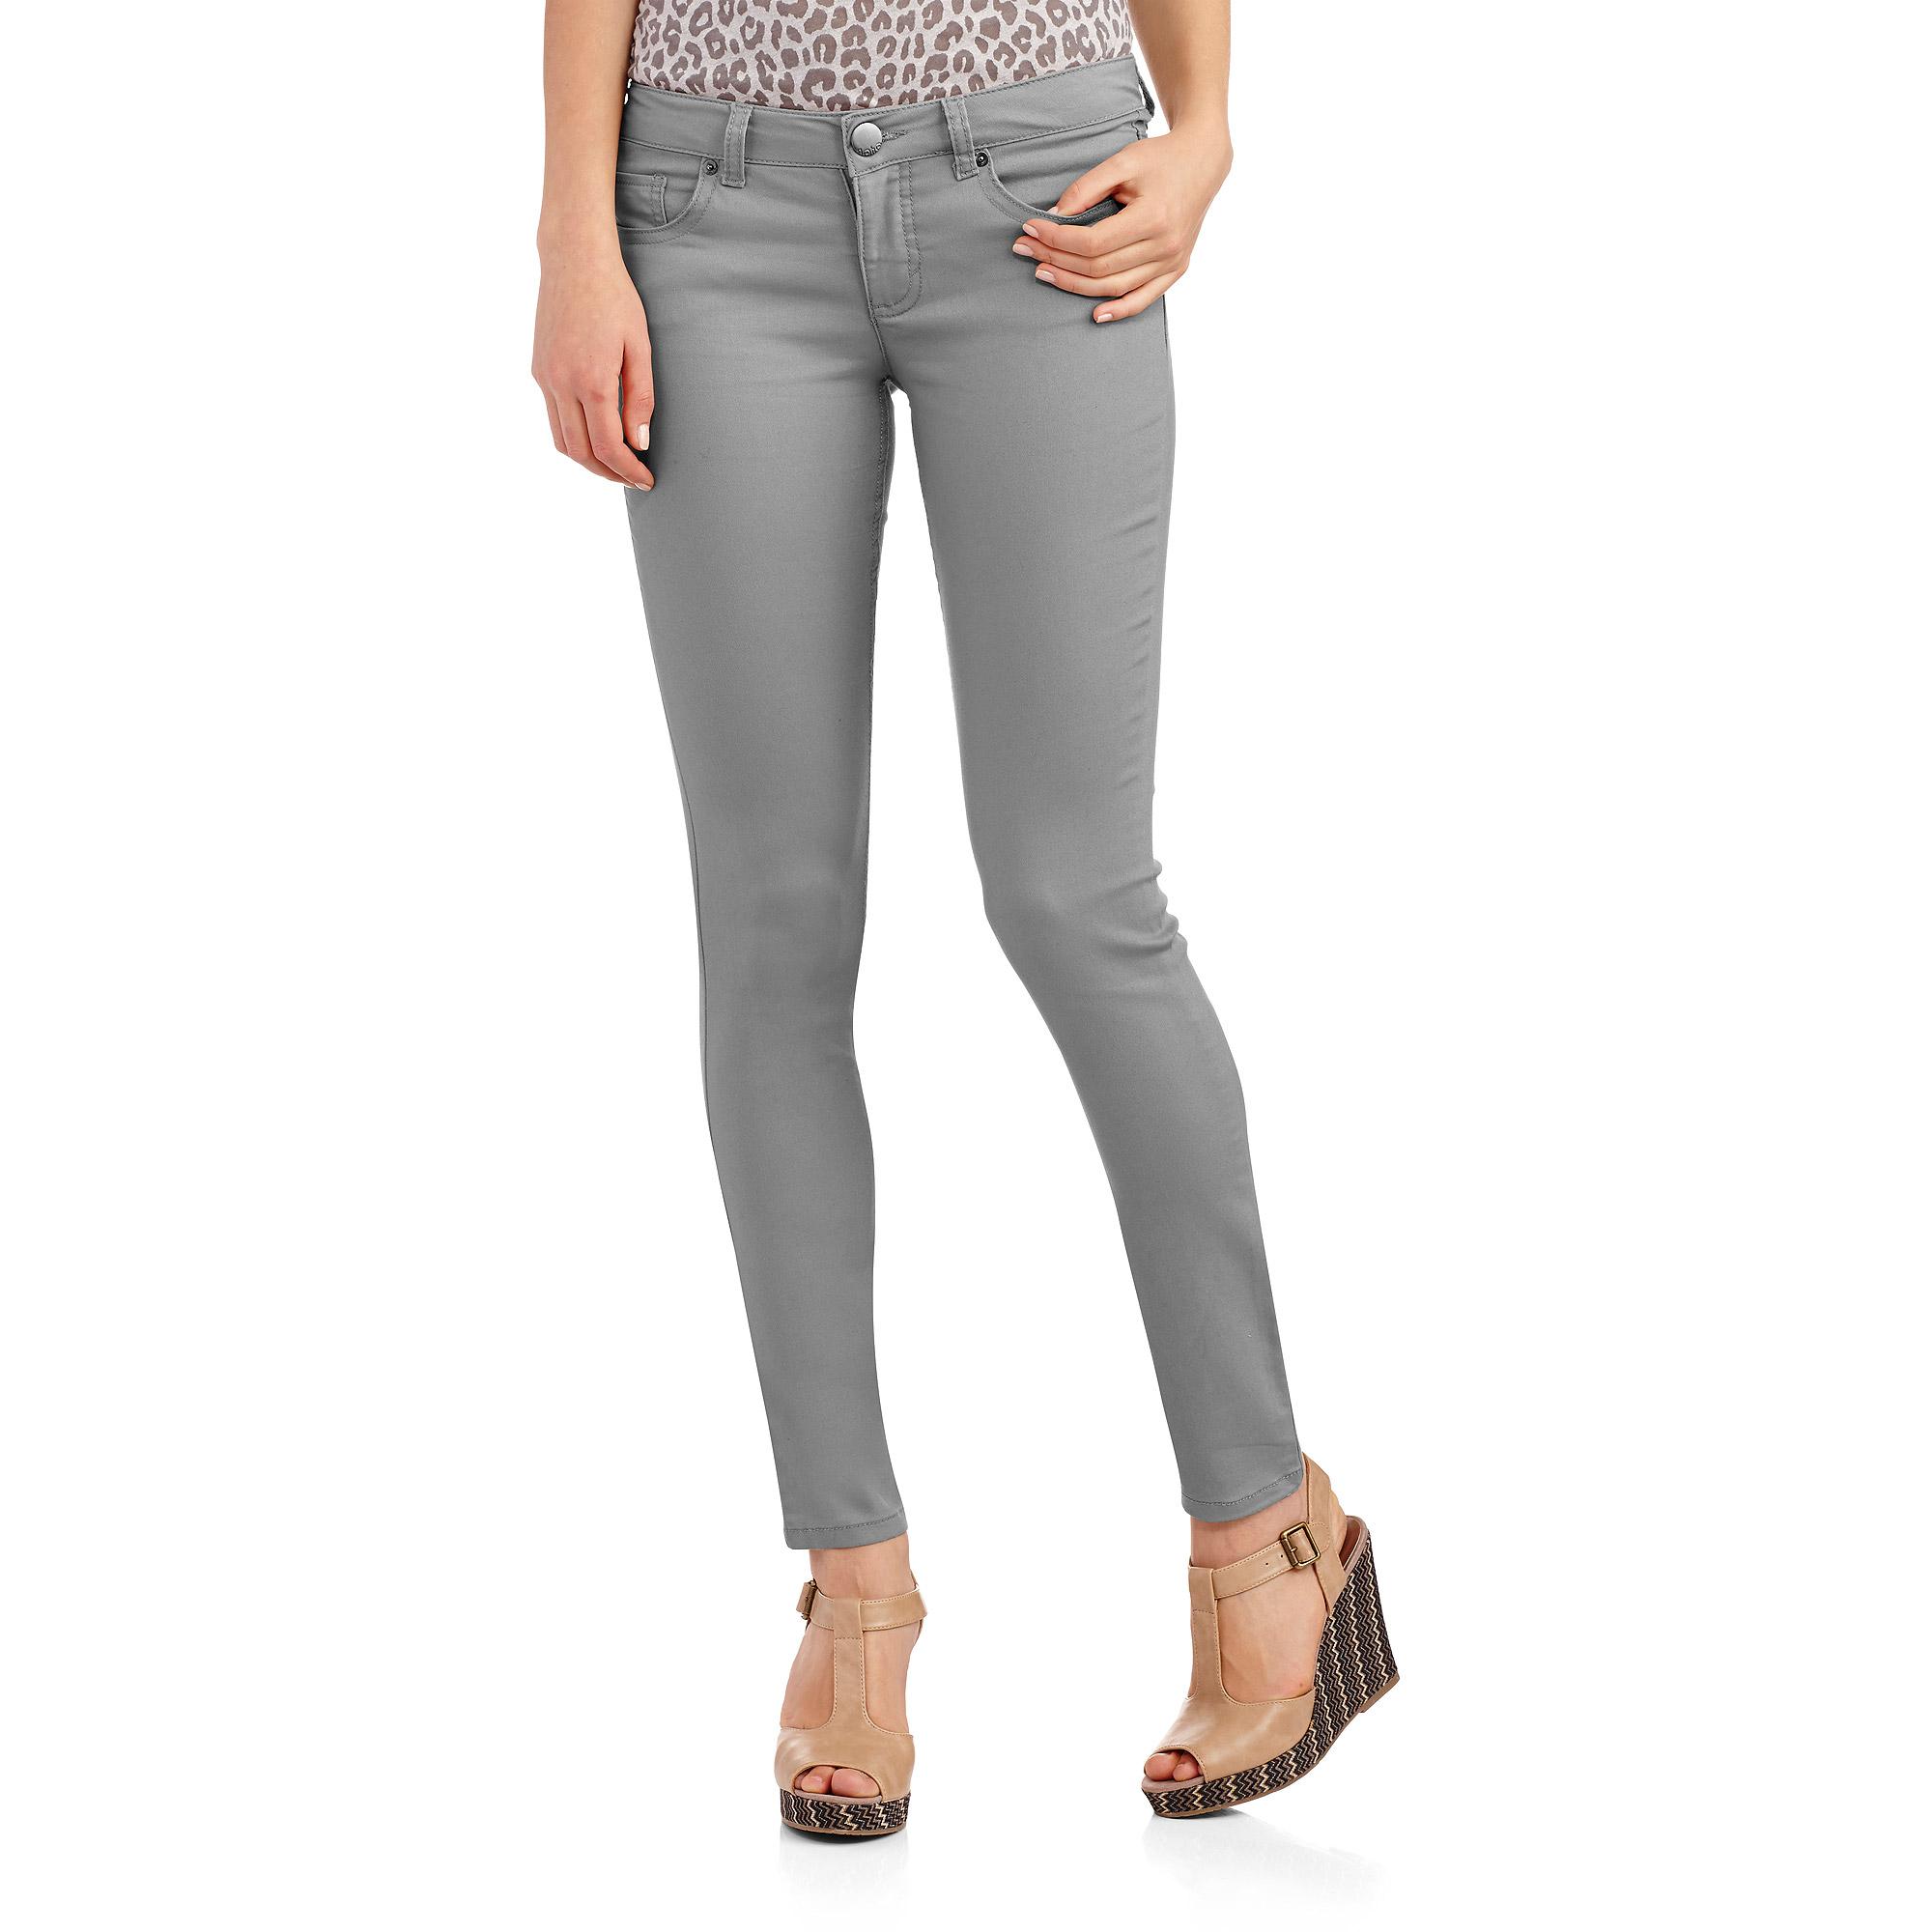 No Boundaries Juniors' Colored Skinny Jeans - Walmart.com